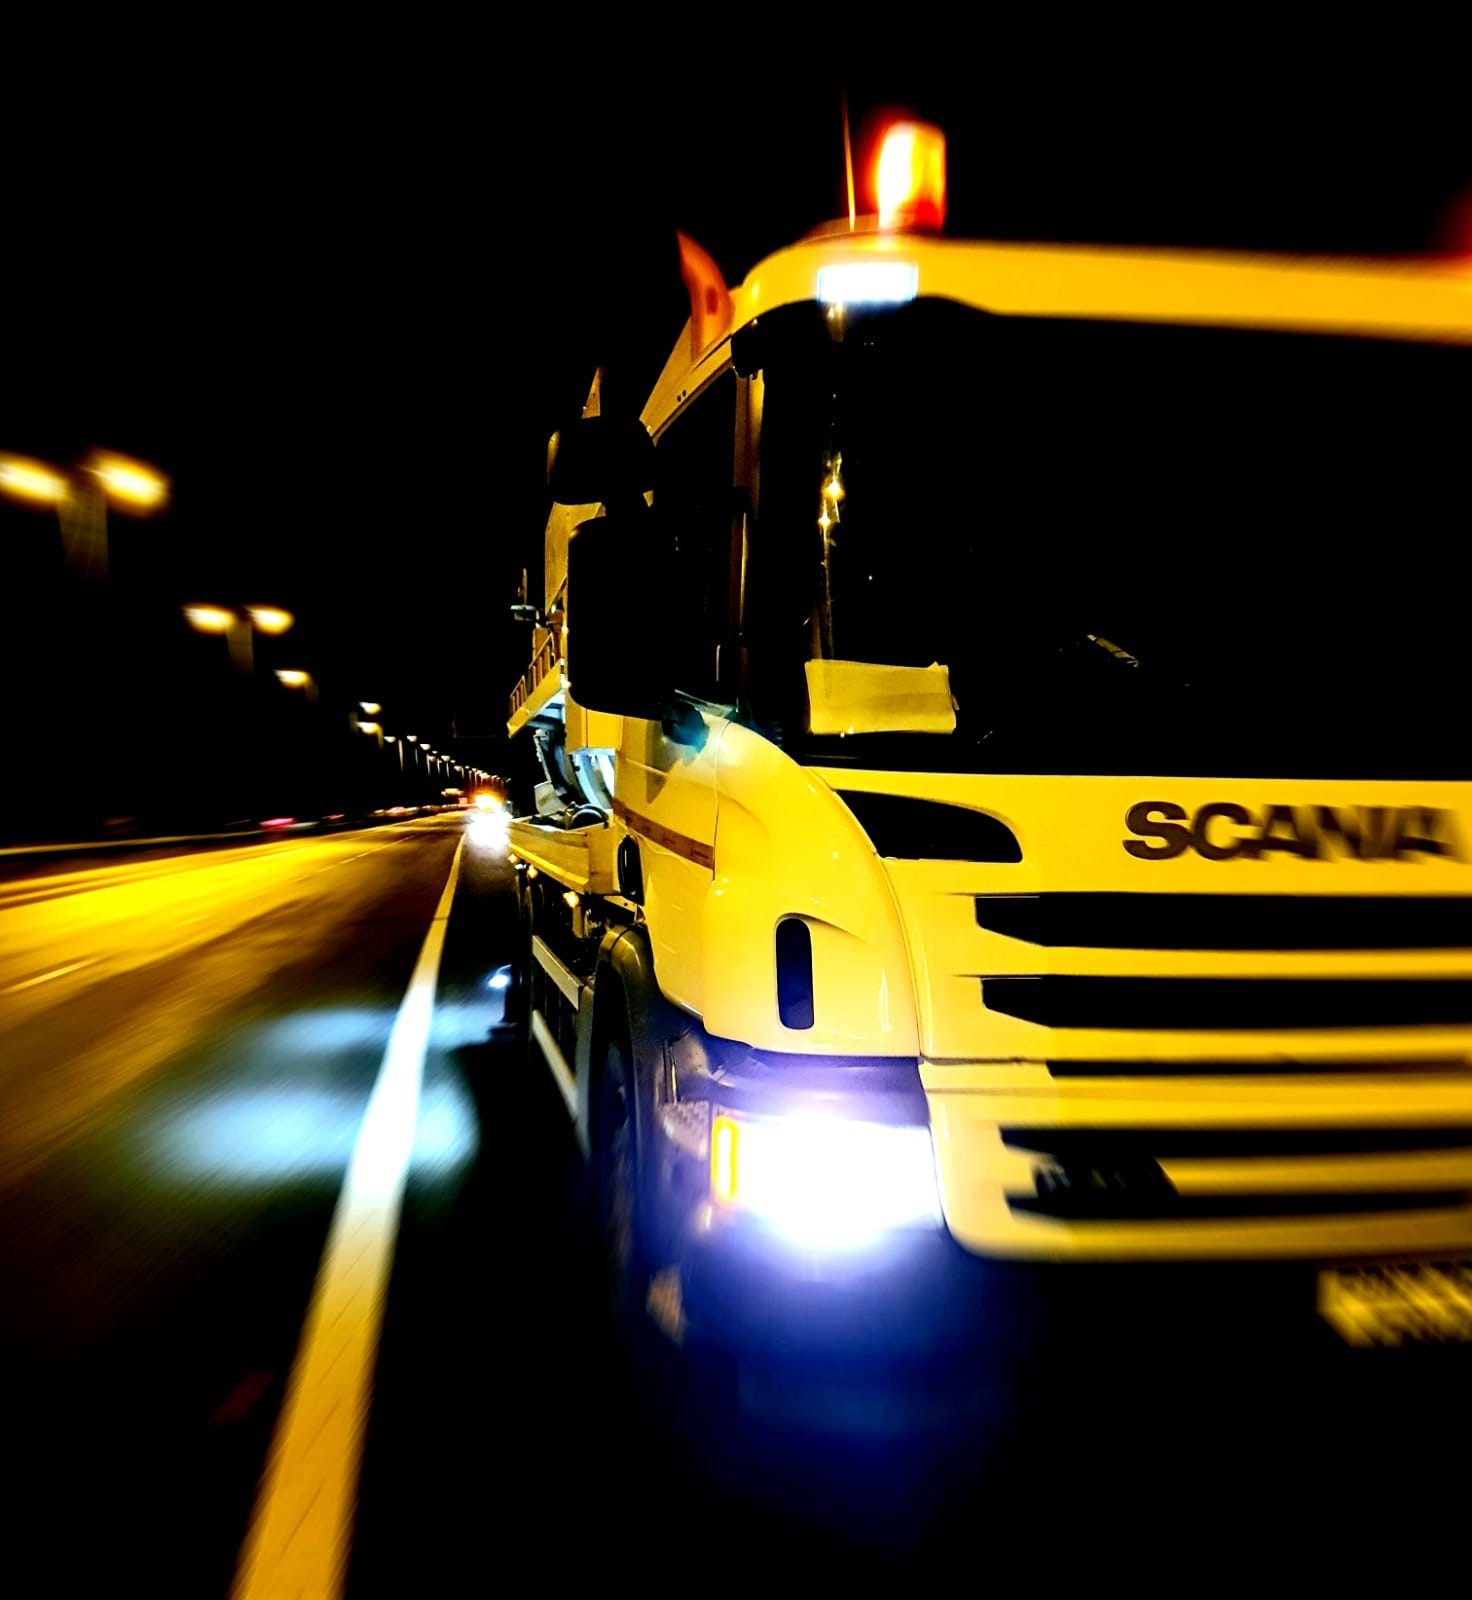 Rceycler Lorry wokring on Motorway